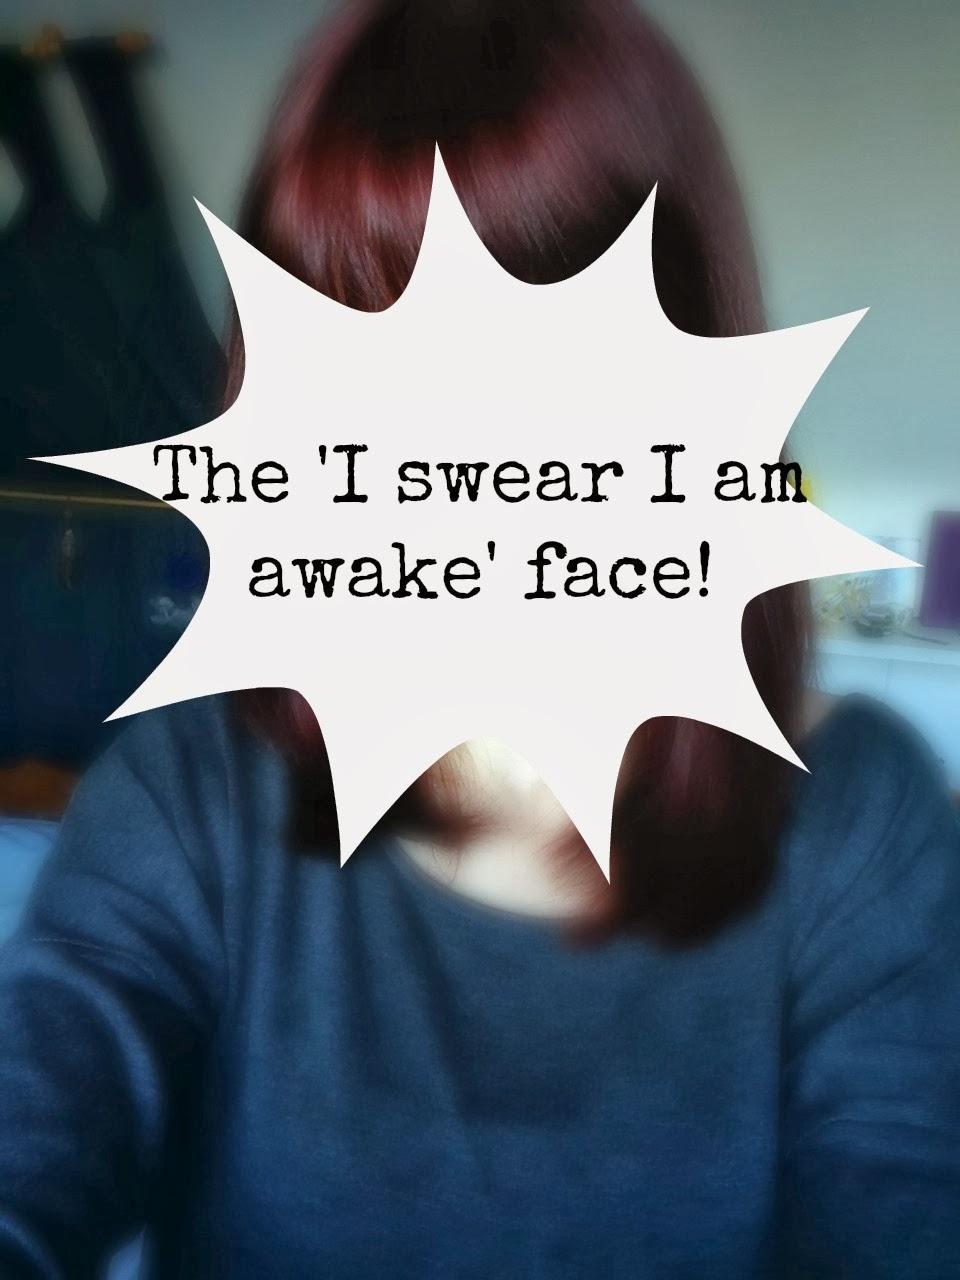 Beauty – 'I swear I am awake!'